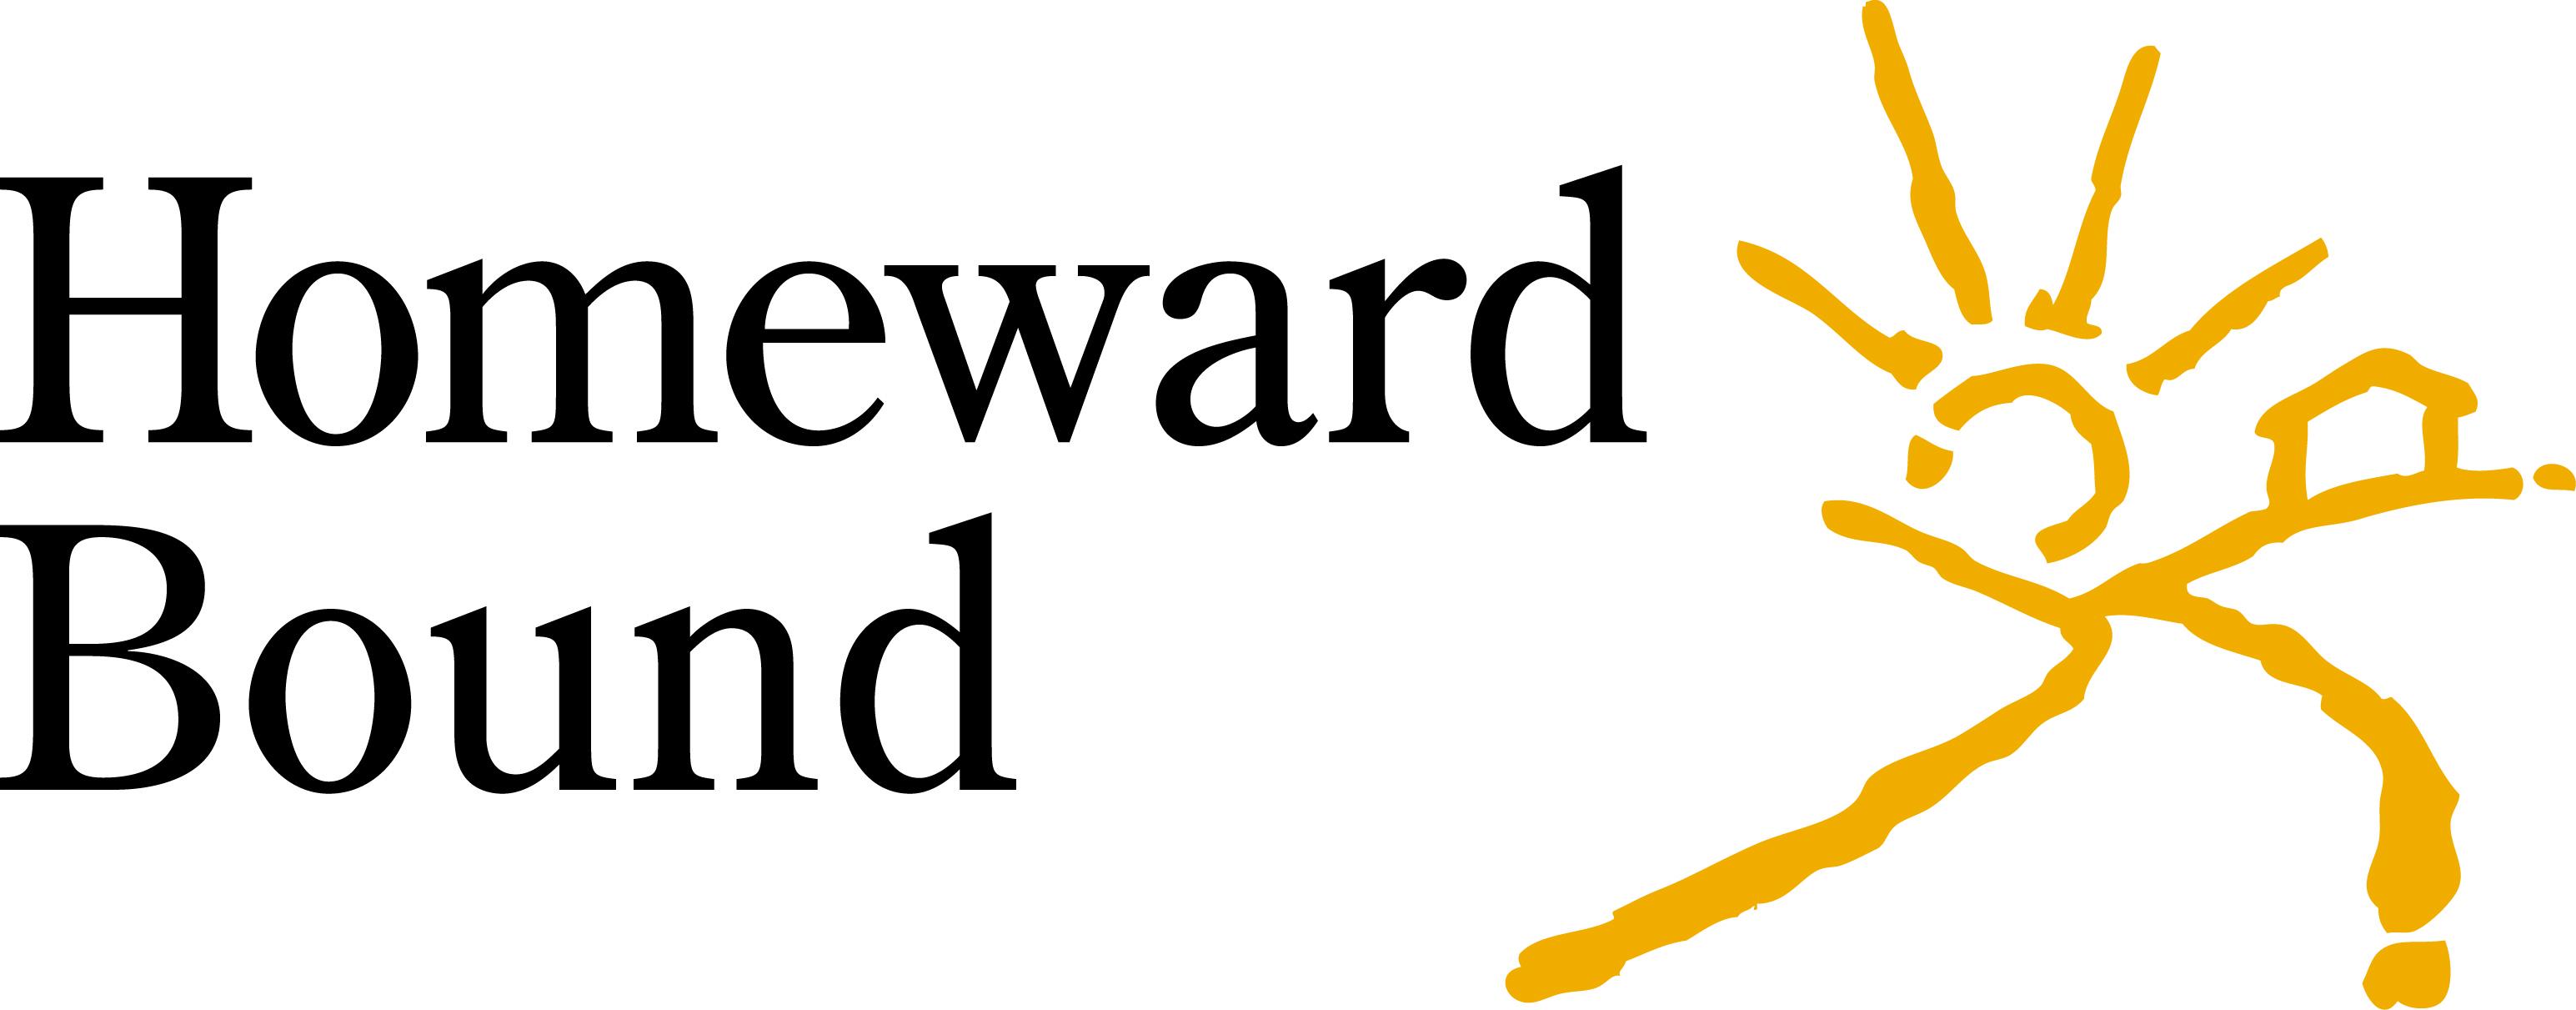 Homeward-Bound-Charity-of-the-Year-Logo